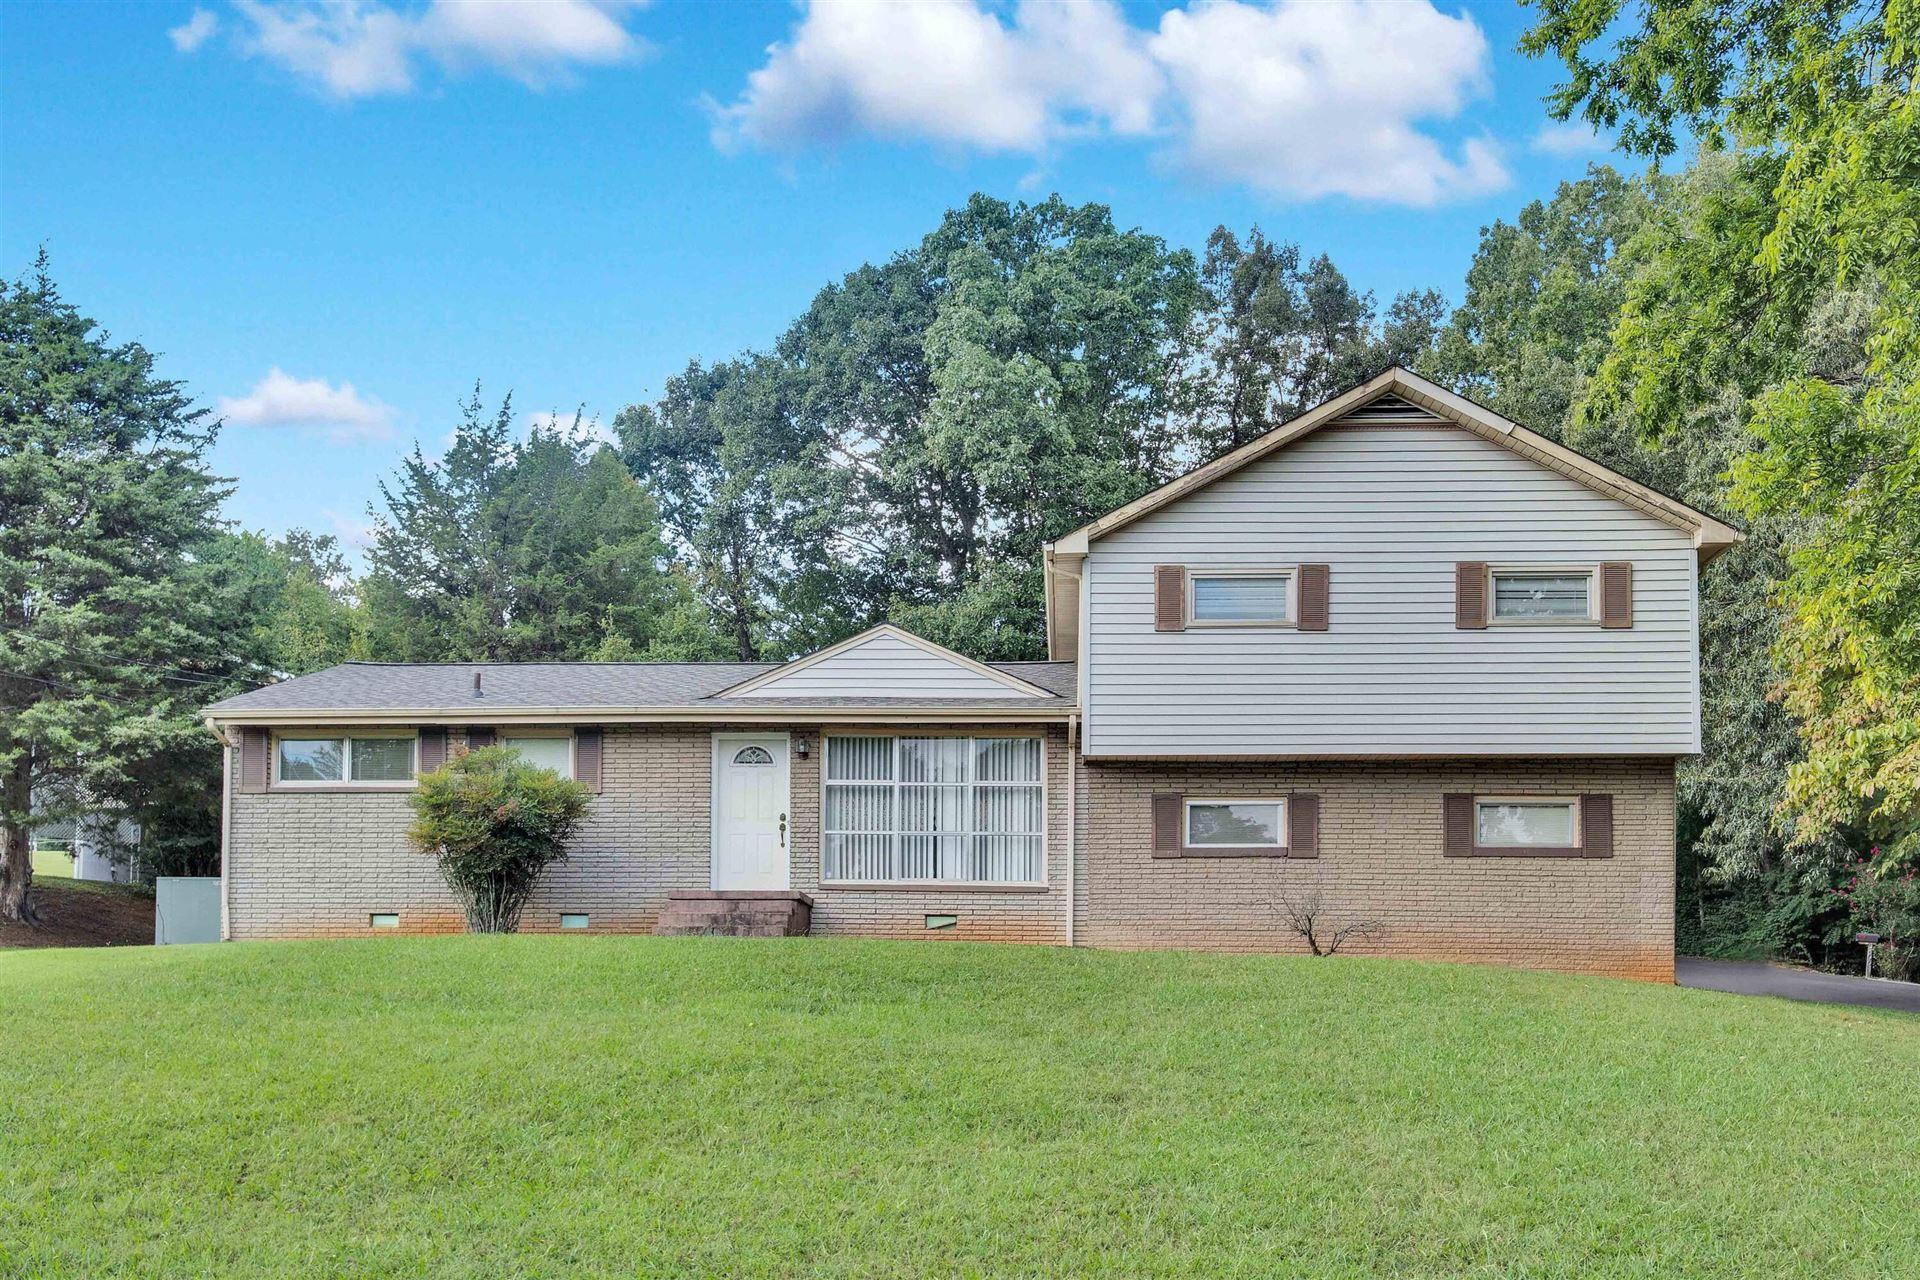 619 Tillman Rd, Knoxville, TN 37912 - MLS#: 1167893